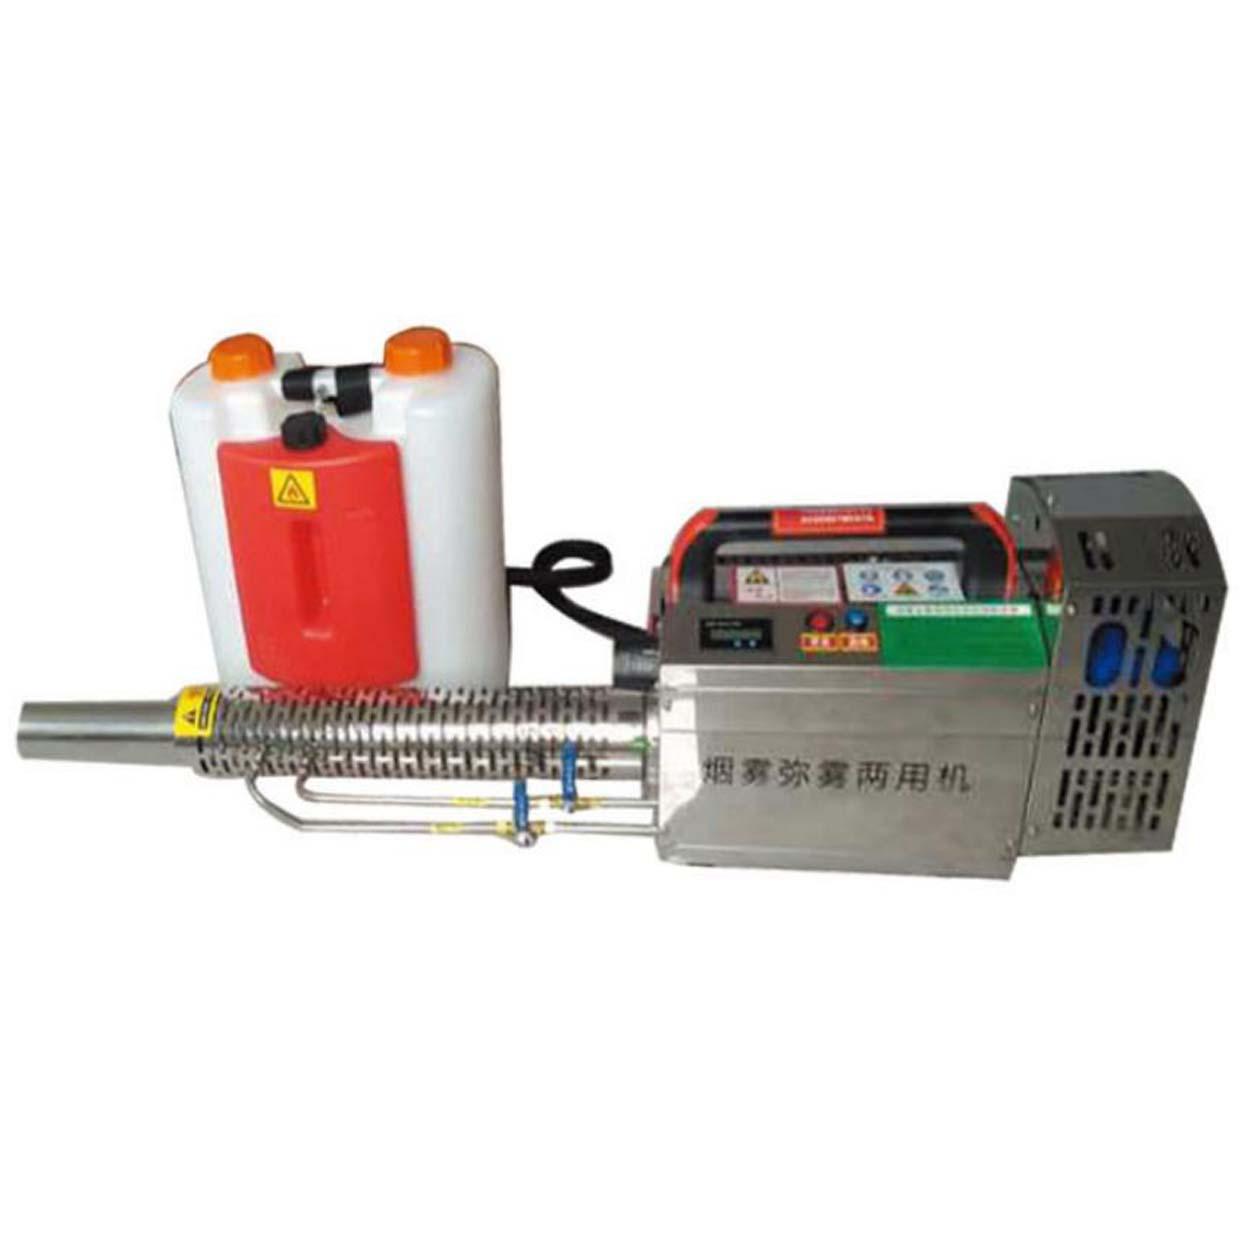 Thermal fogger agricultural garden machine smoke fog planting  sprayer  1